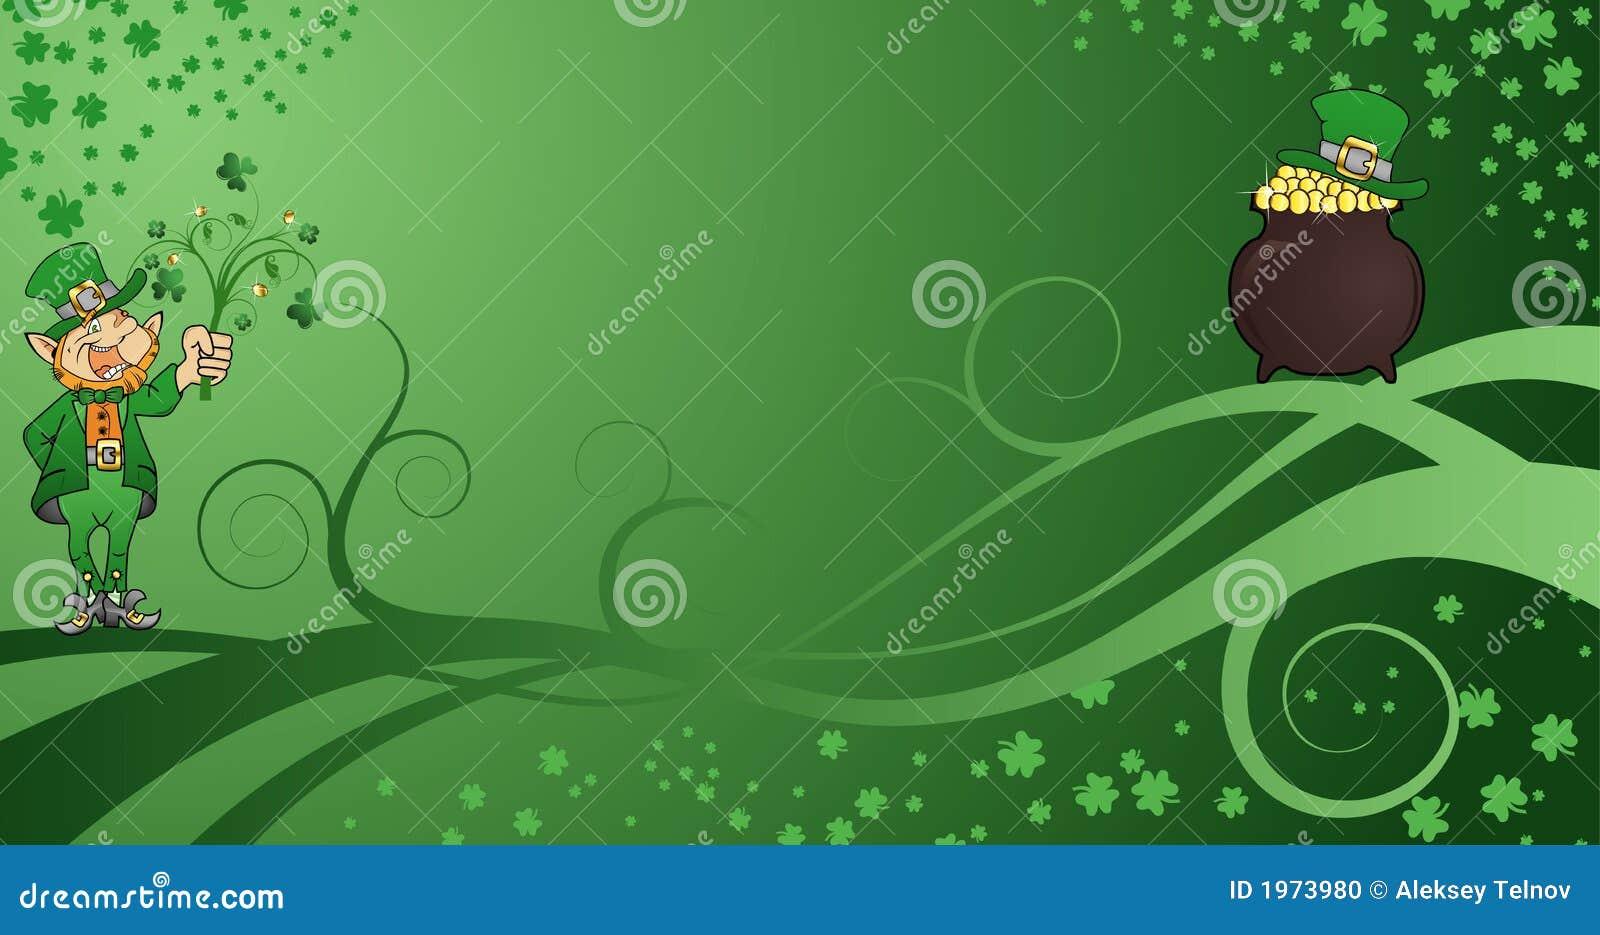 St. Patrick's Background Stock Vector. Illustration Of